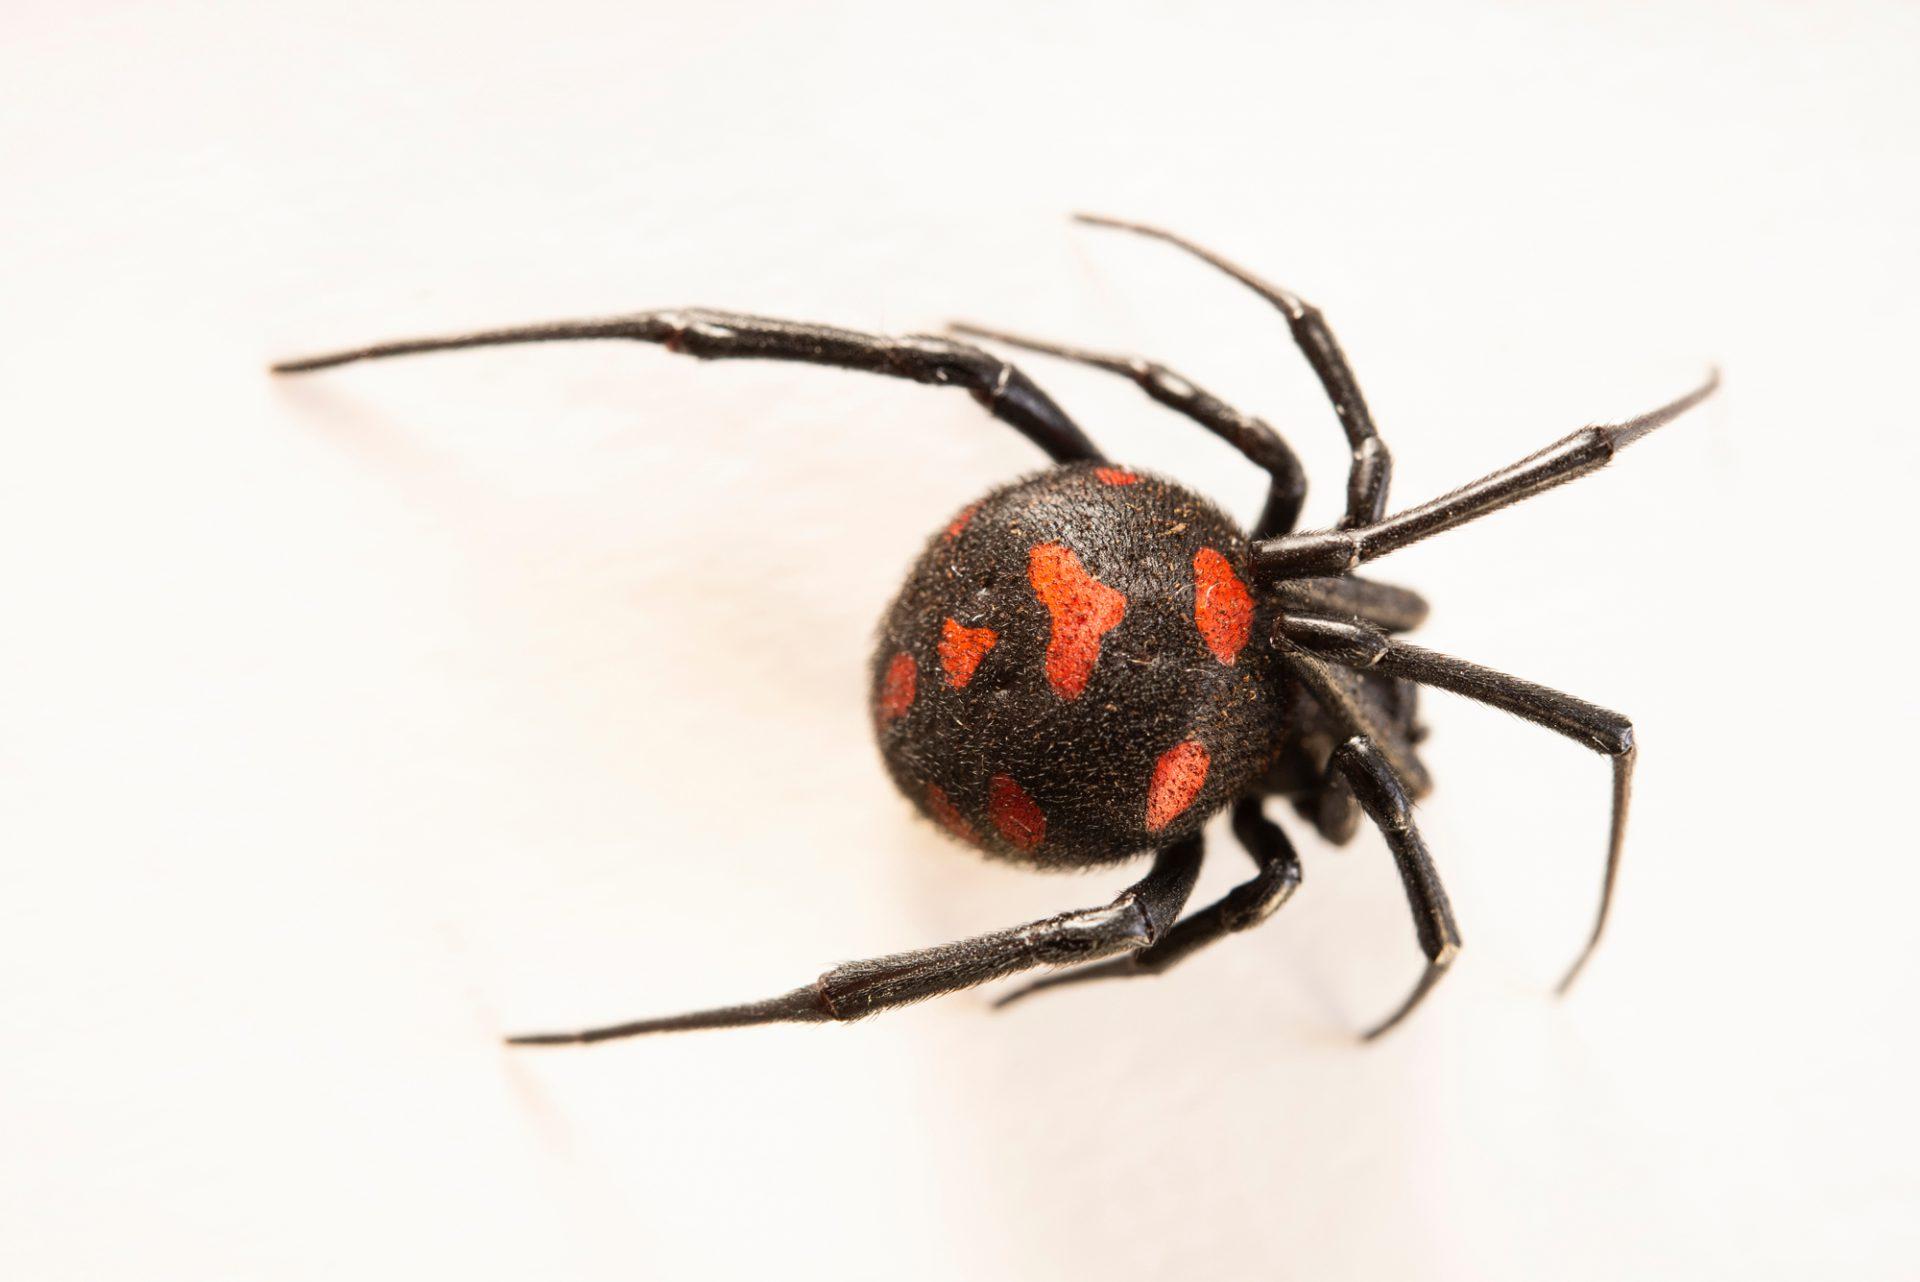 Photo: A European black widow (Latrodectus tredecimguttatus) at Museum of Nature South Tyrol.